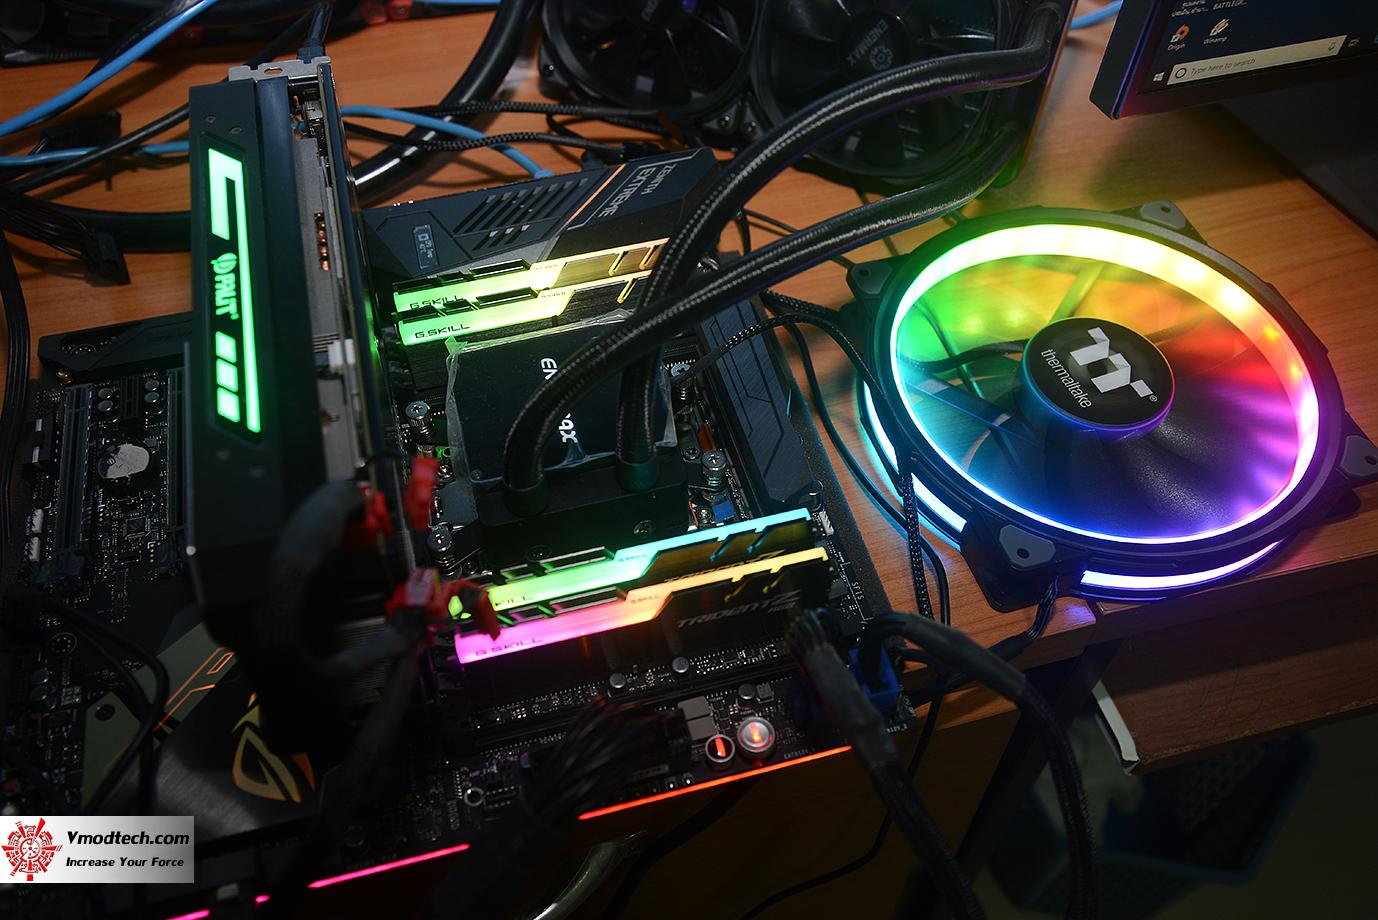 dsc 6641 Thermaltake Riing Plus 20 RGB Case Fan TT Premium Edition (Single Fan Pack w/o Controller) Review